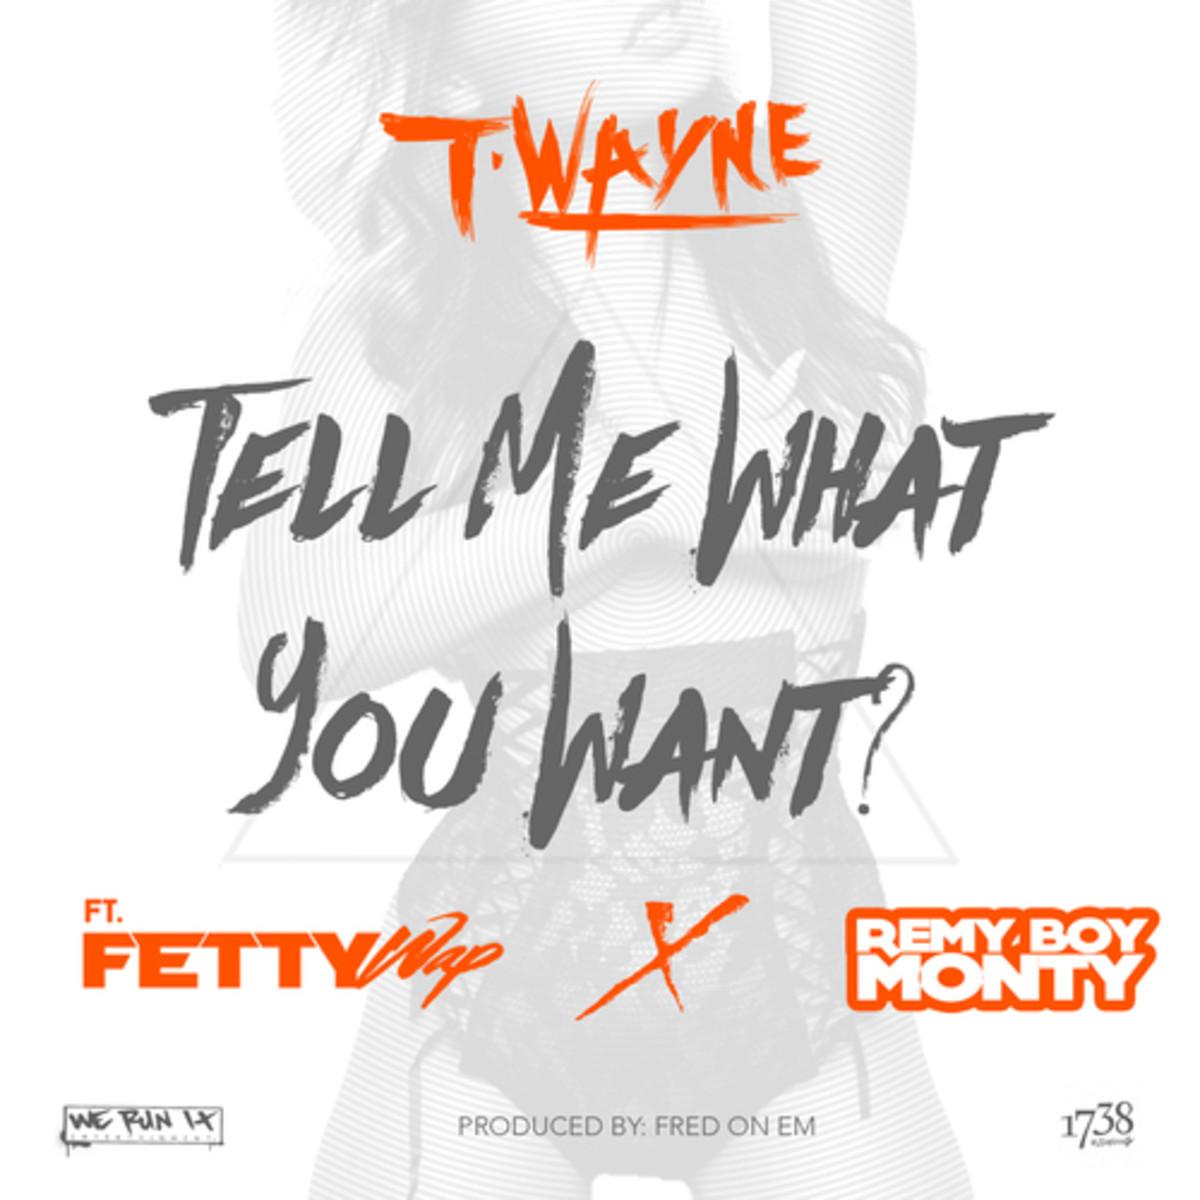 t-wayne-tell-me-what-you-want.jpeg